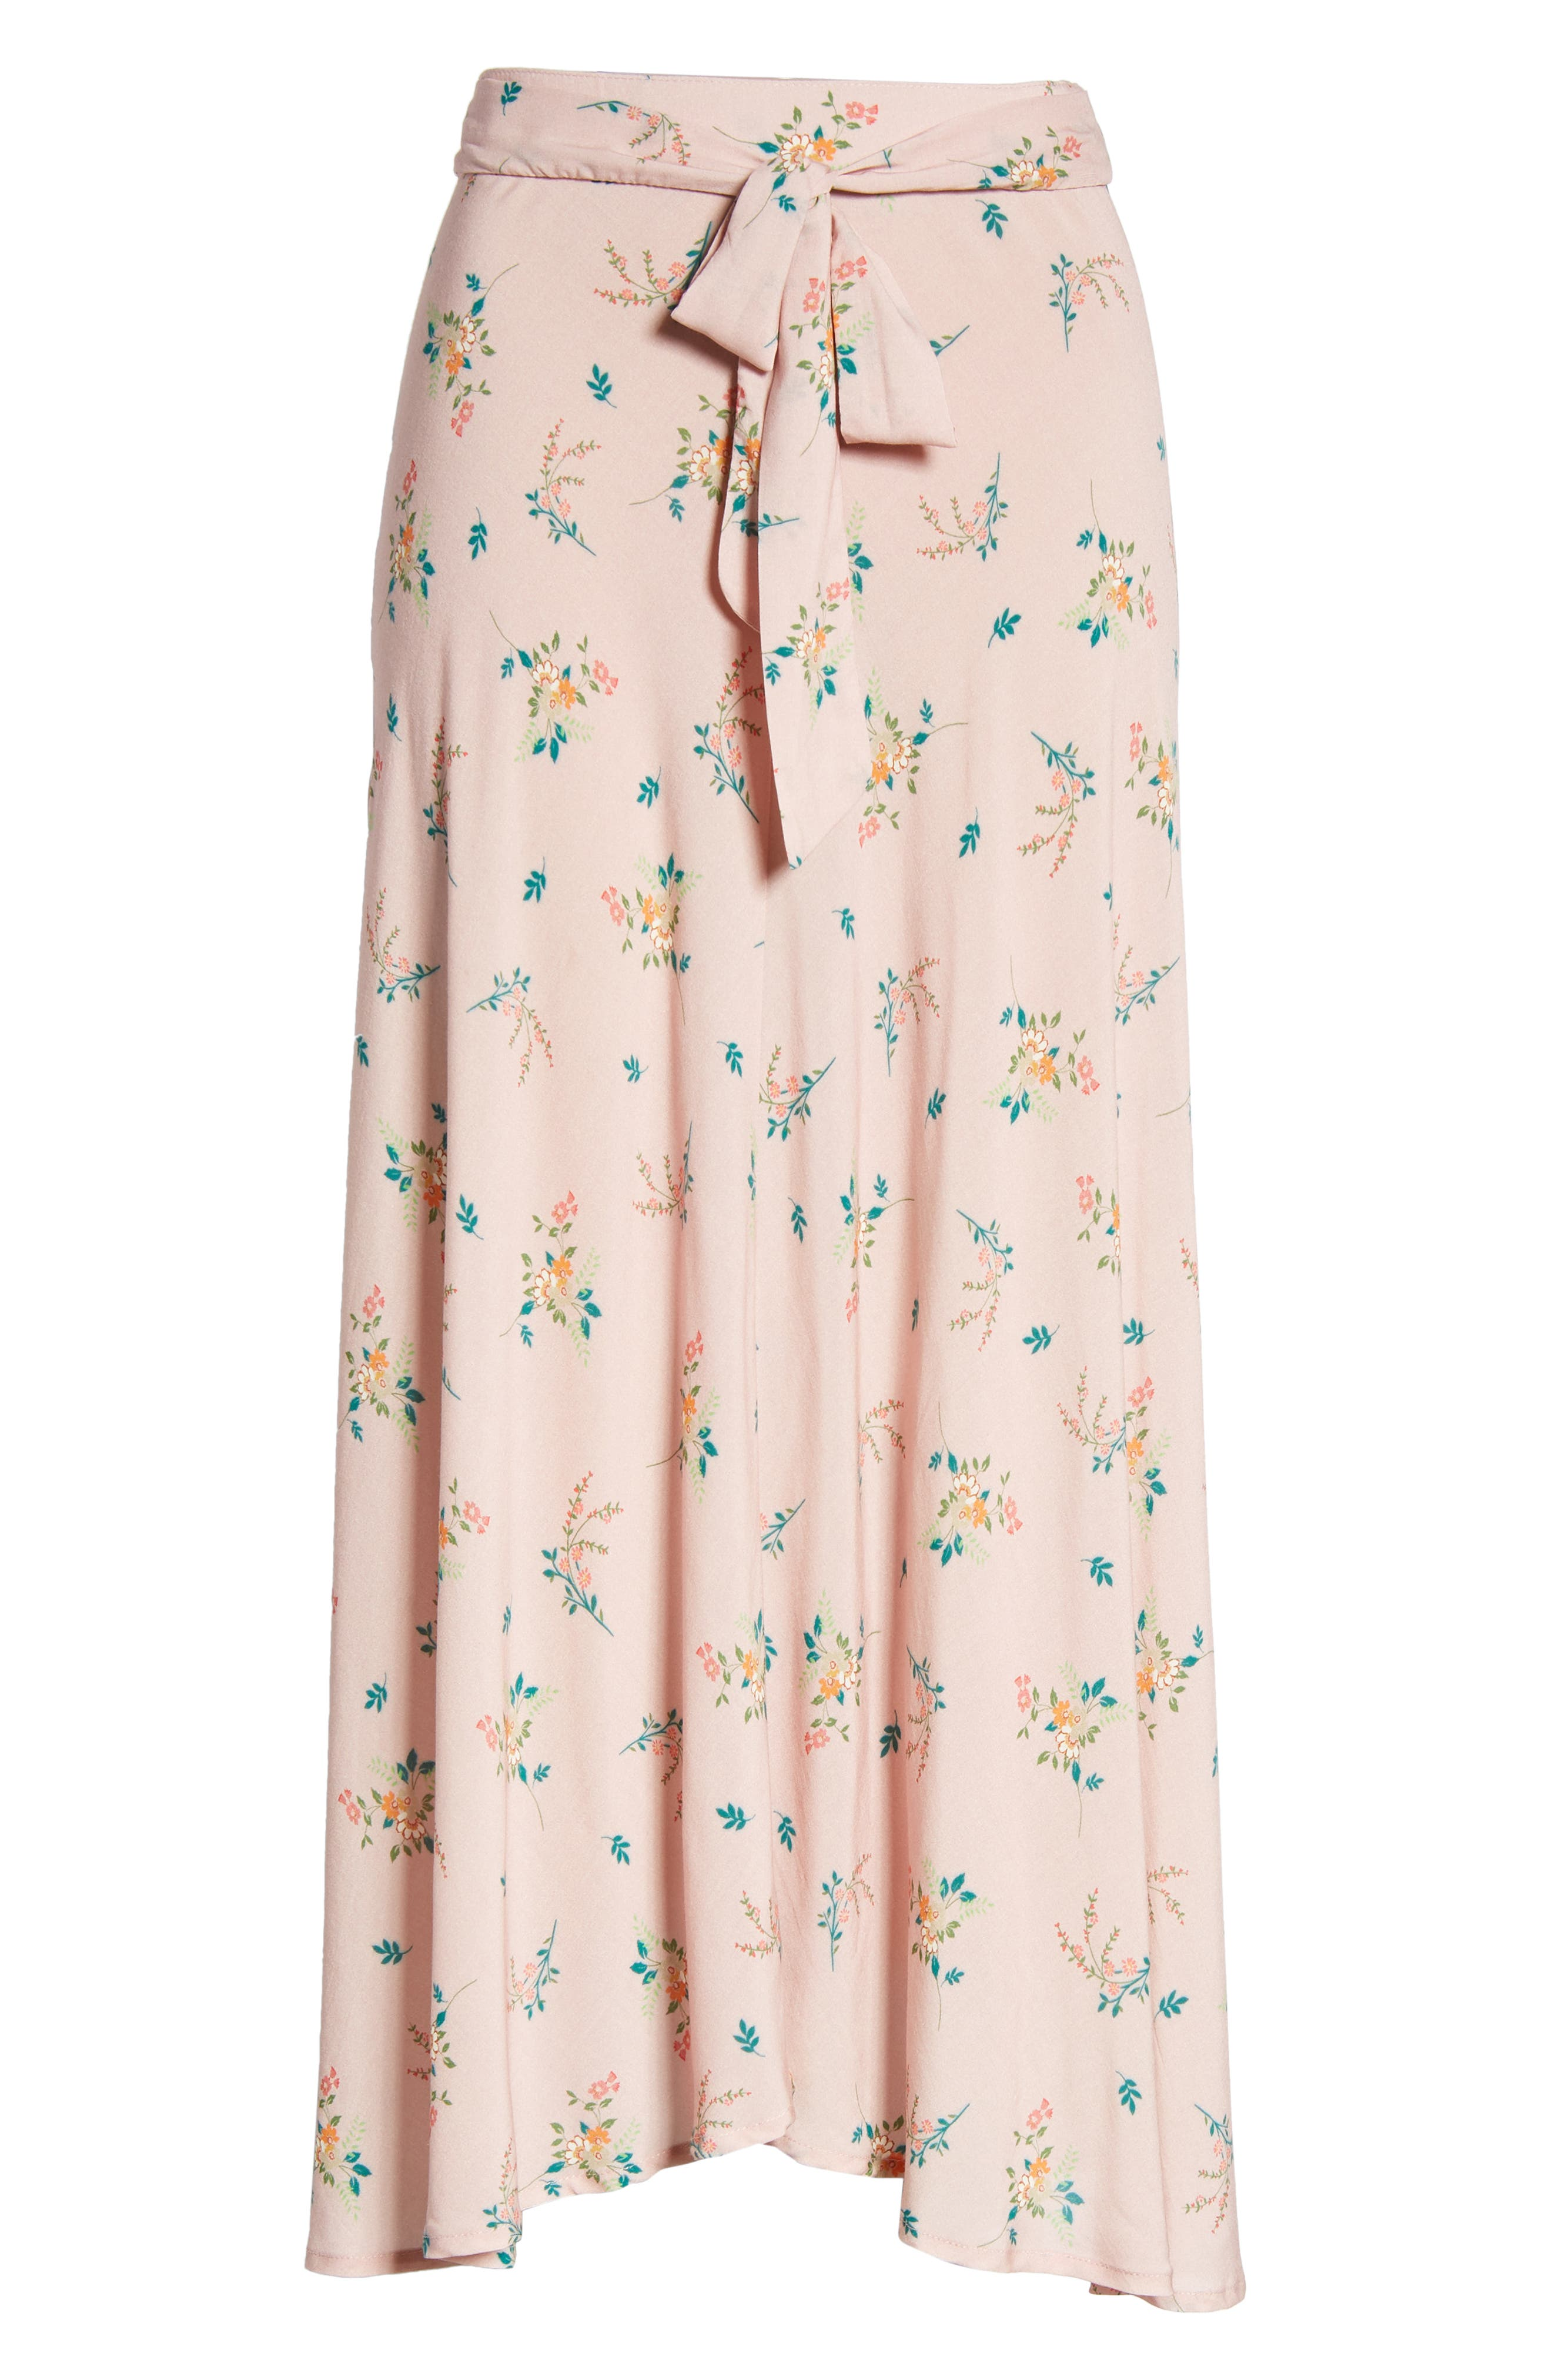 Floral Print Midi Skirt,                             Alternate thumbnail 6, color,                             657